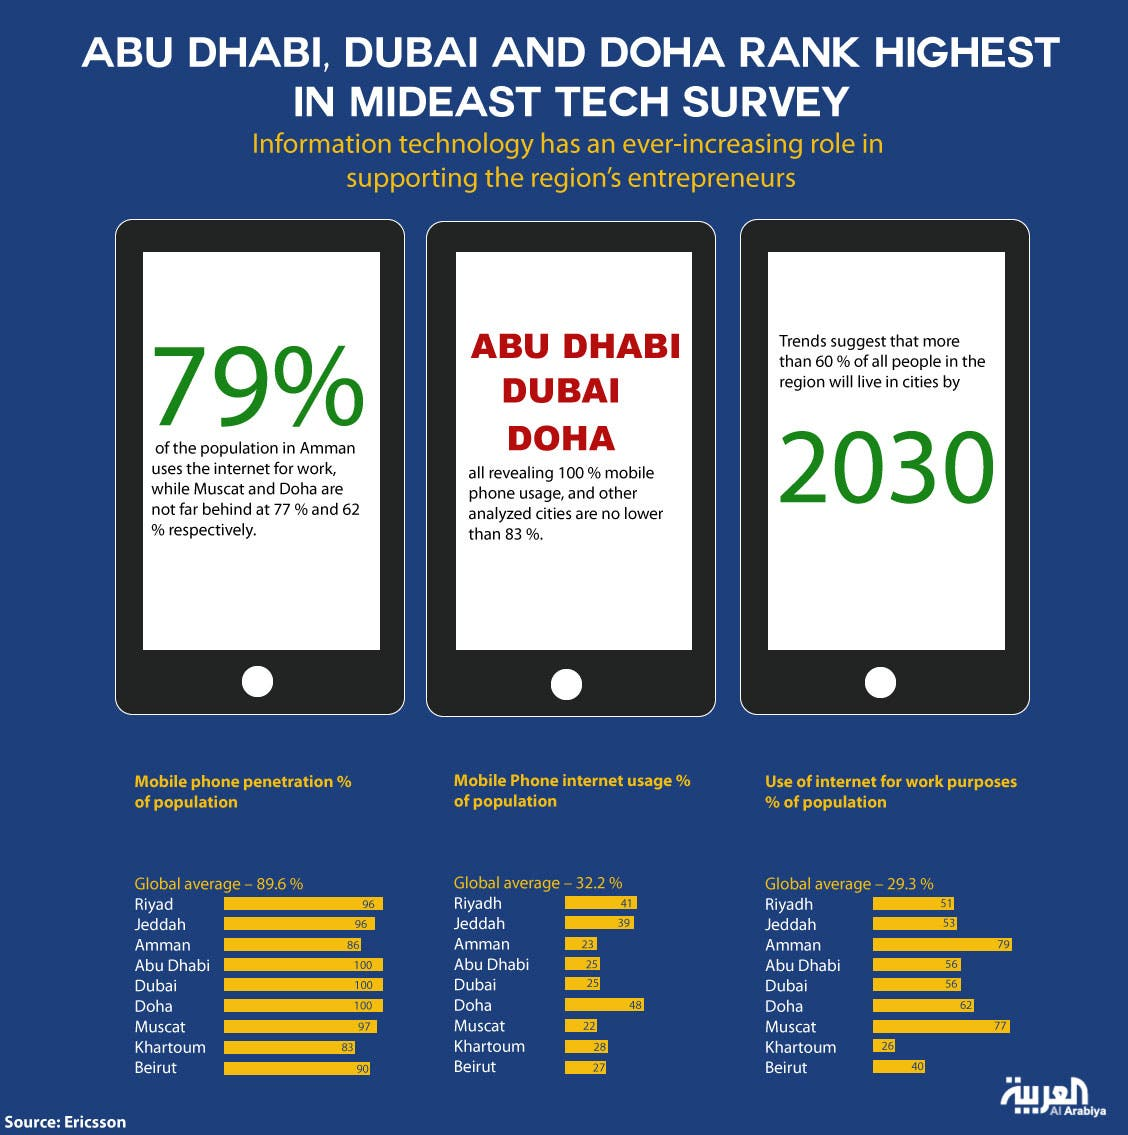 infographic: Abu Dhabi, Dubai and Doha rank highest in Mideast tech survey